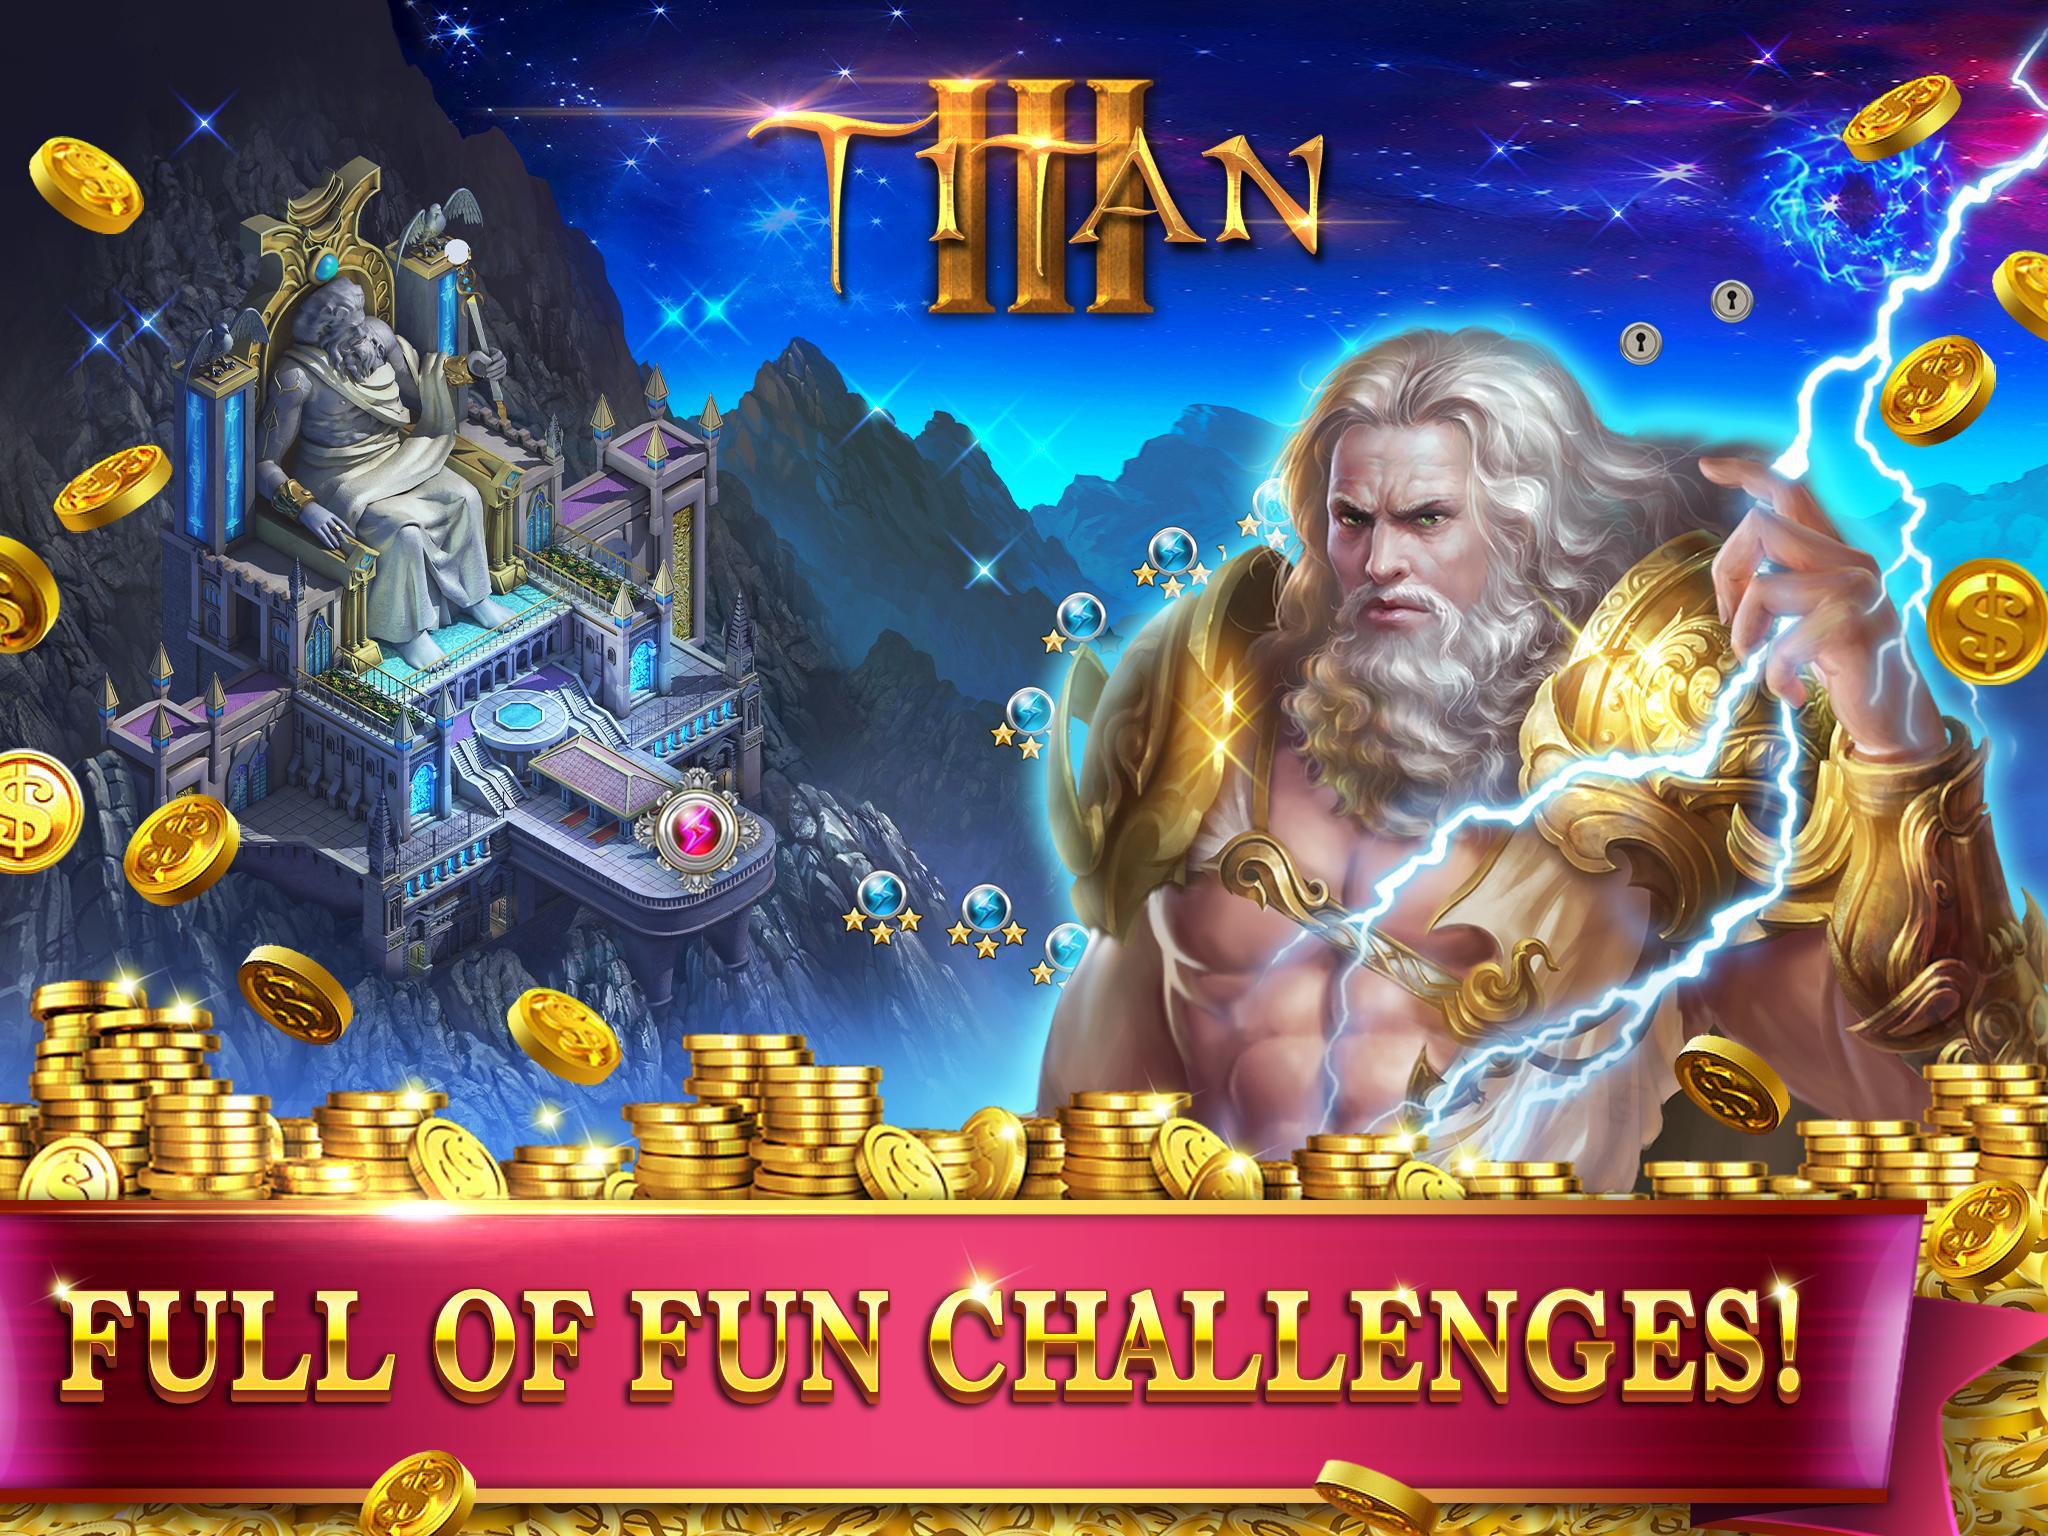 Titan Slot